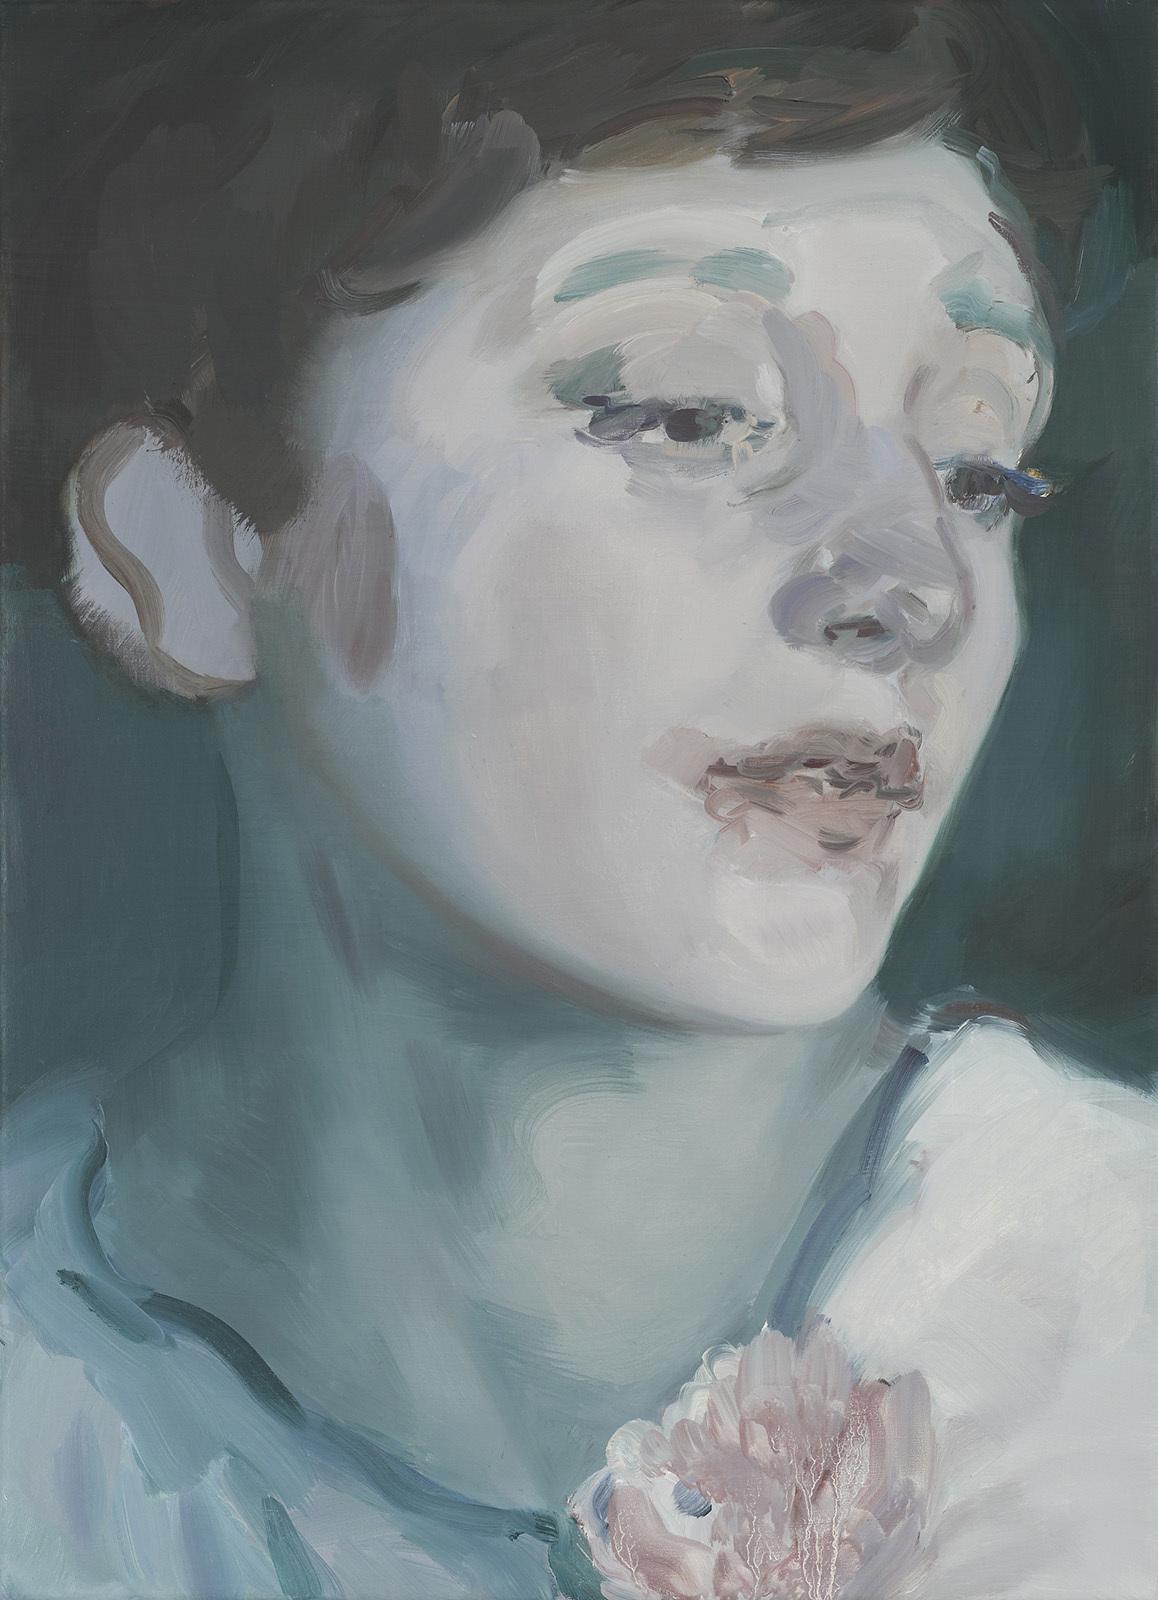 Maureen-Paley-Kaye-Donachie-Exhibition-Image.jpg